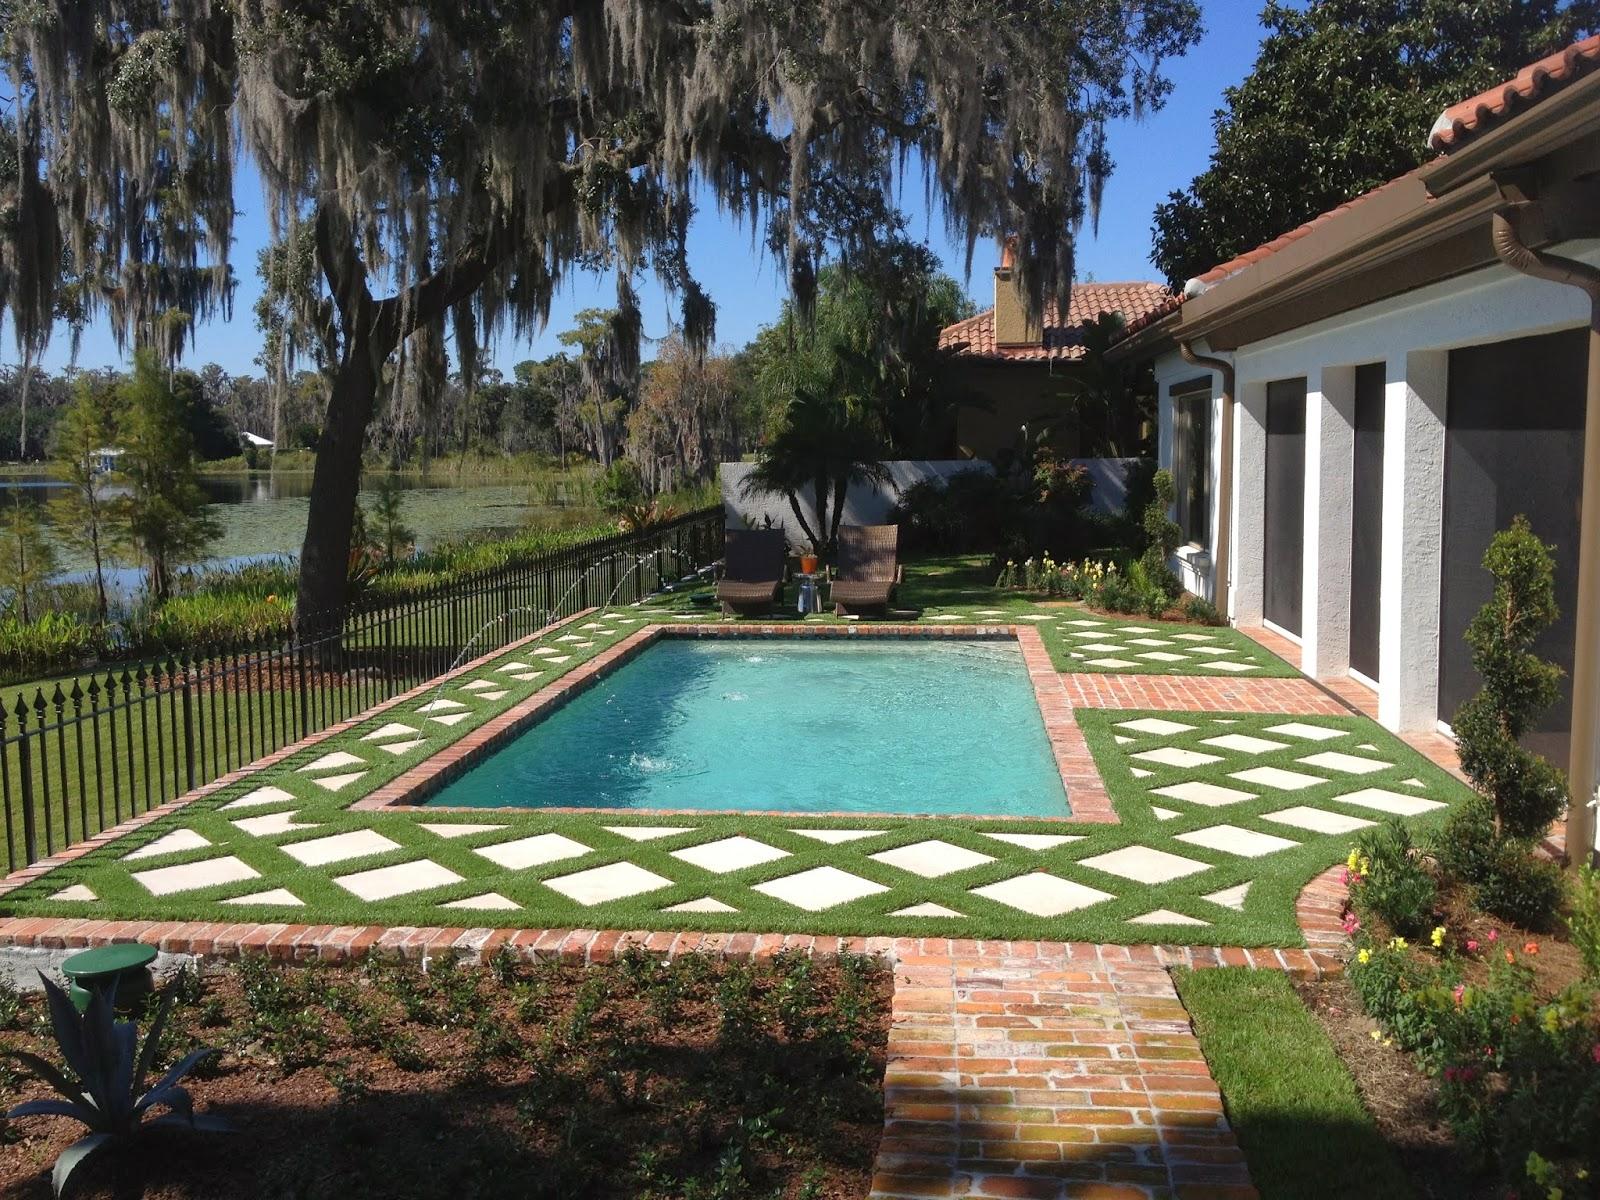 Signature Pools Swimming Pools In Orlando Pool Builders Orlando Custom Pools Orlando